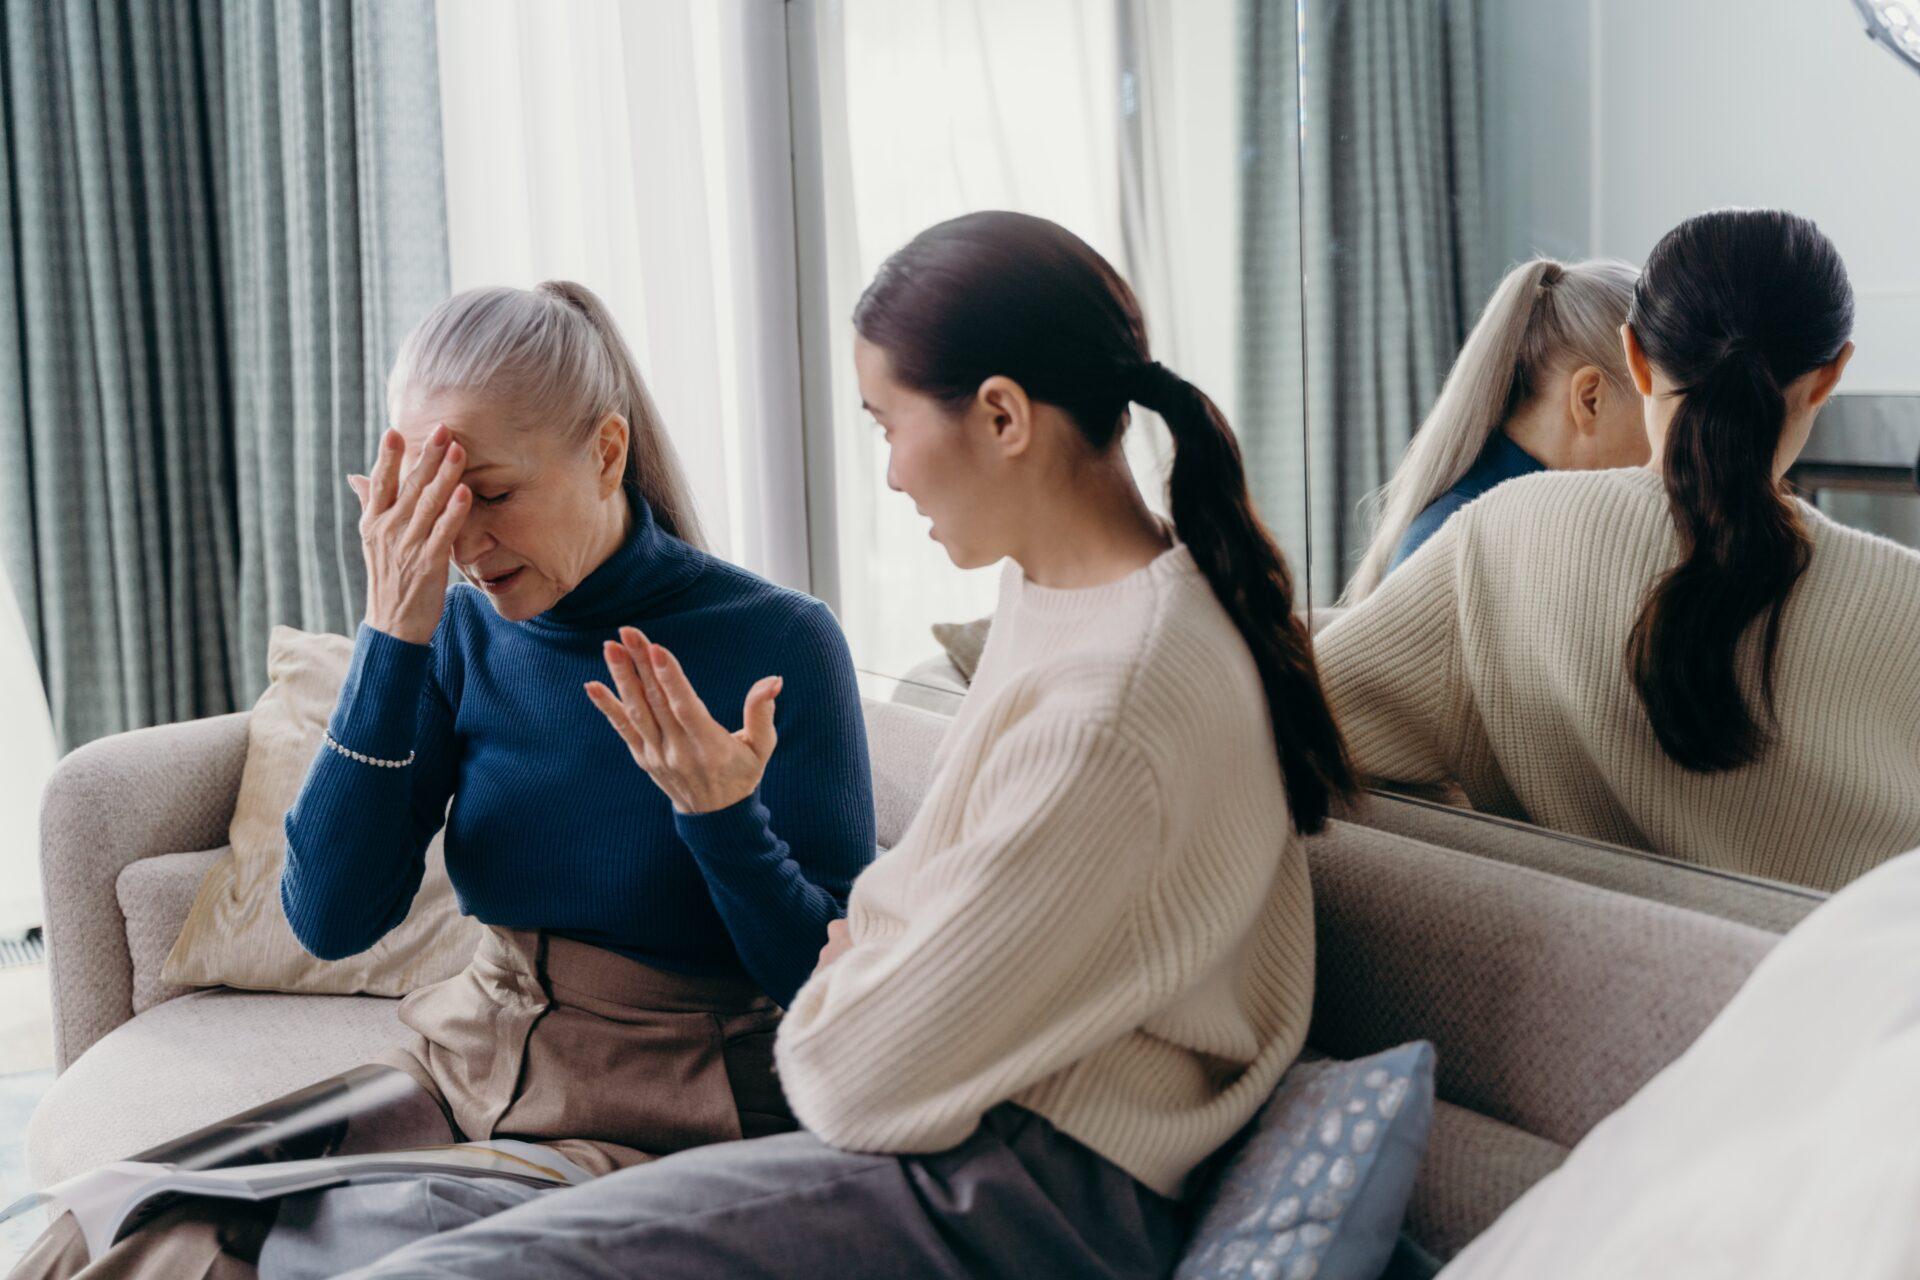 parforhold-parforholdsterapi-tale-forbi-kommunikation-parforholdsregler-strategier-psykologi-psykiatri-aarhus